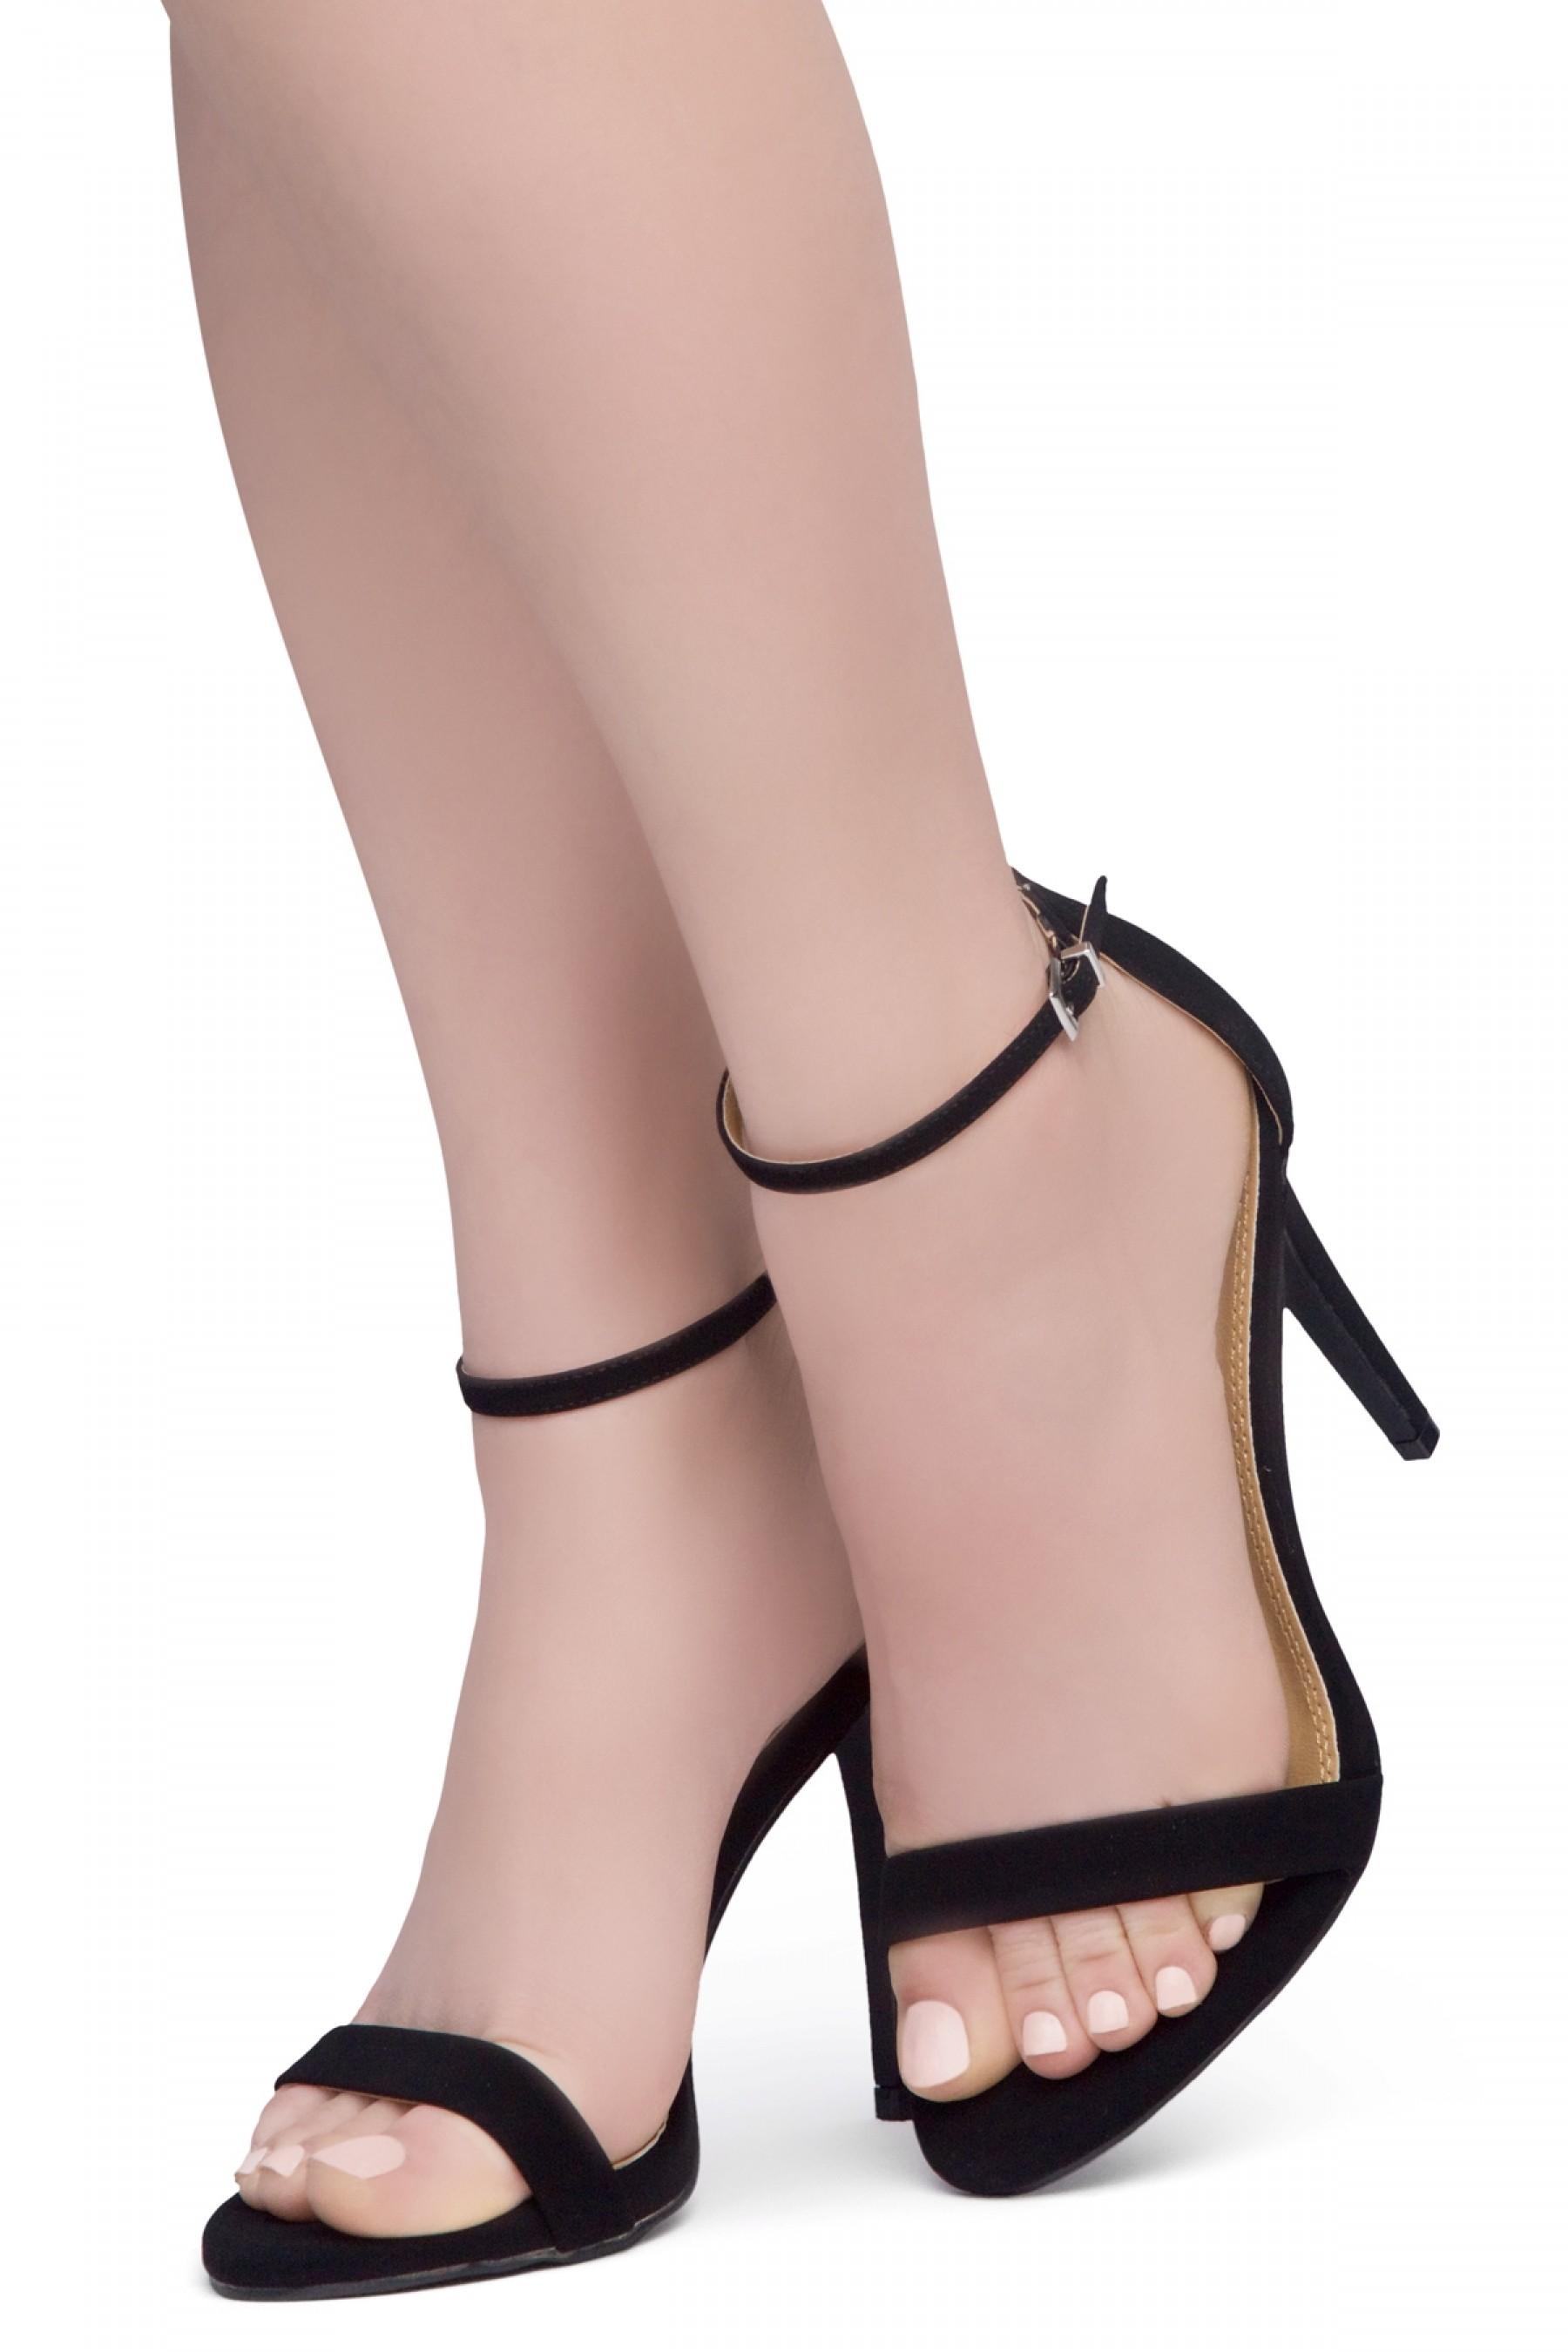 Shoe Land SL-Lovering- Ankle Strap Open Toe Back Closure Stiletto Heel (1896Black)